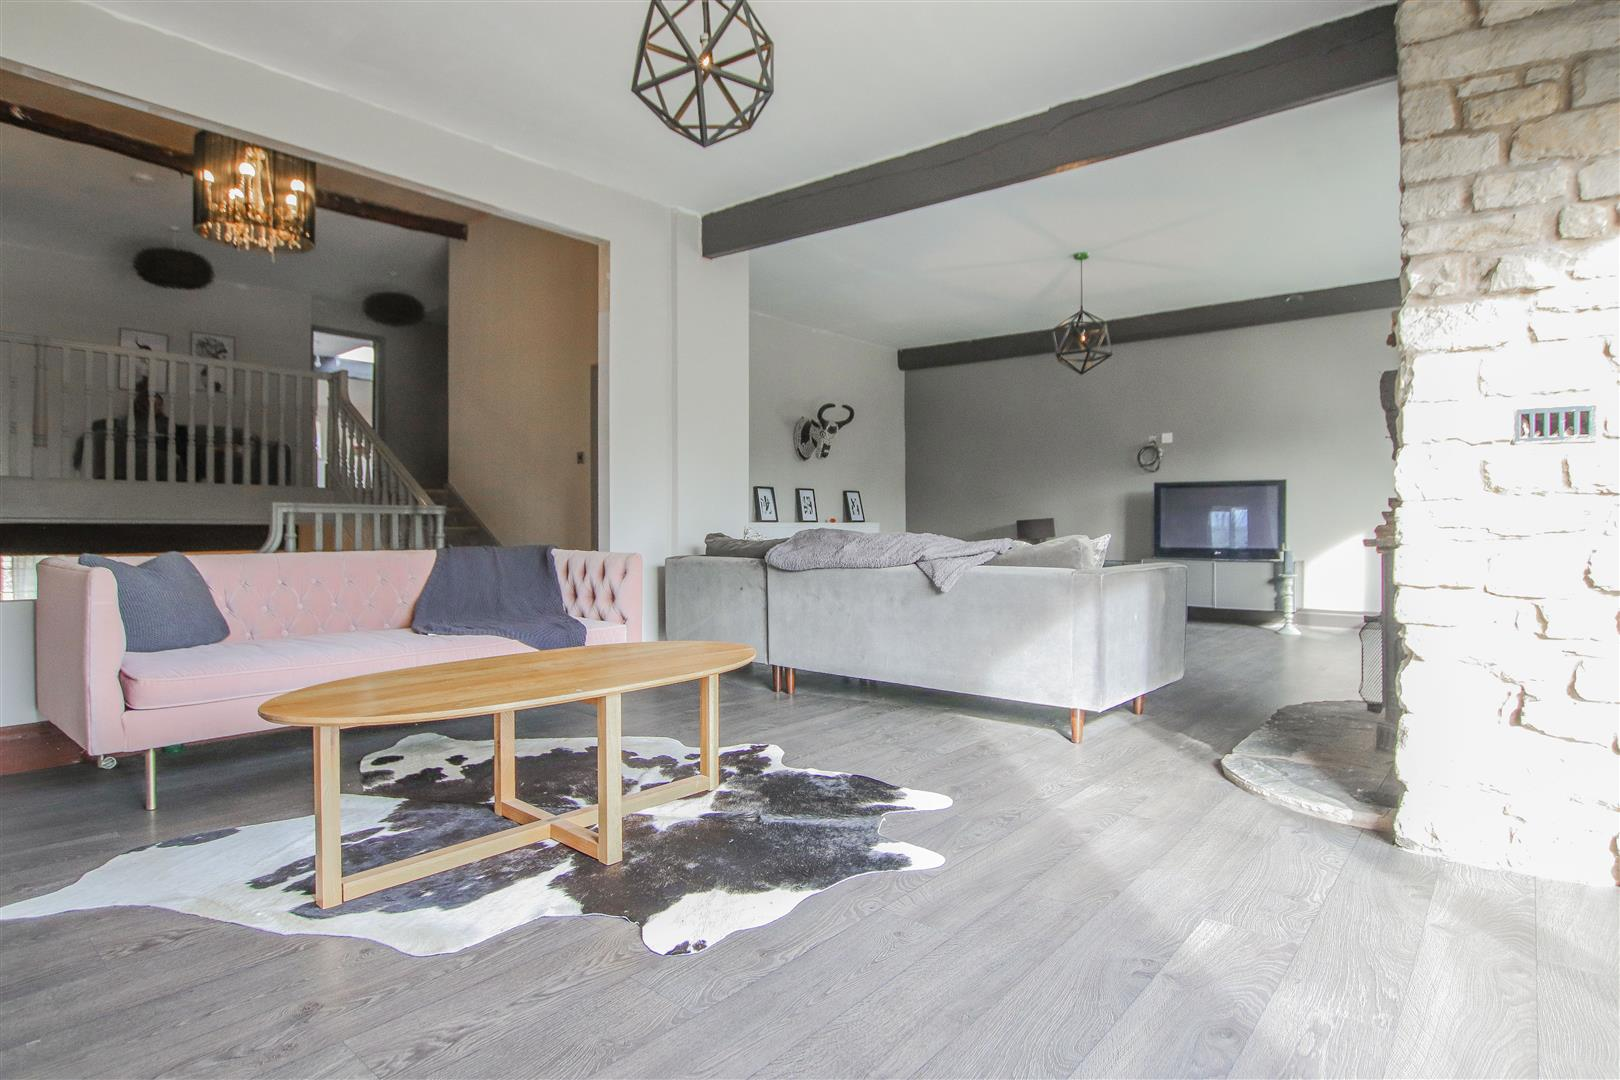 6 Bedroom Barn Conversion For Sale - 34.JPG